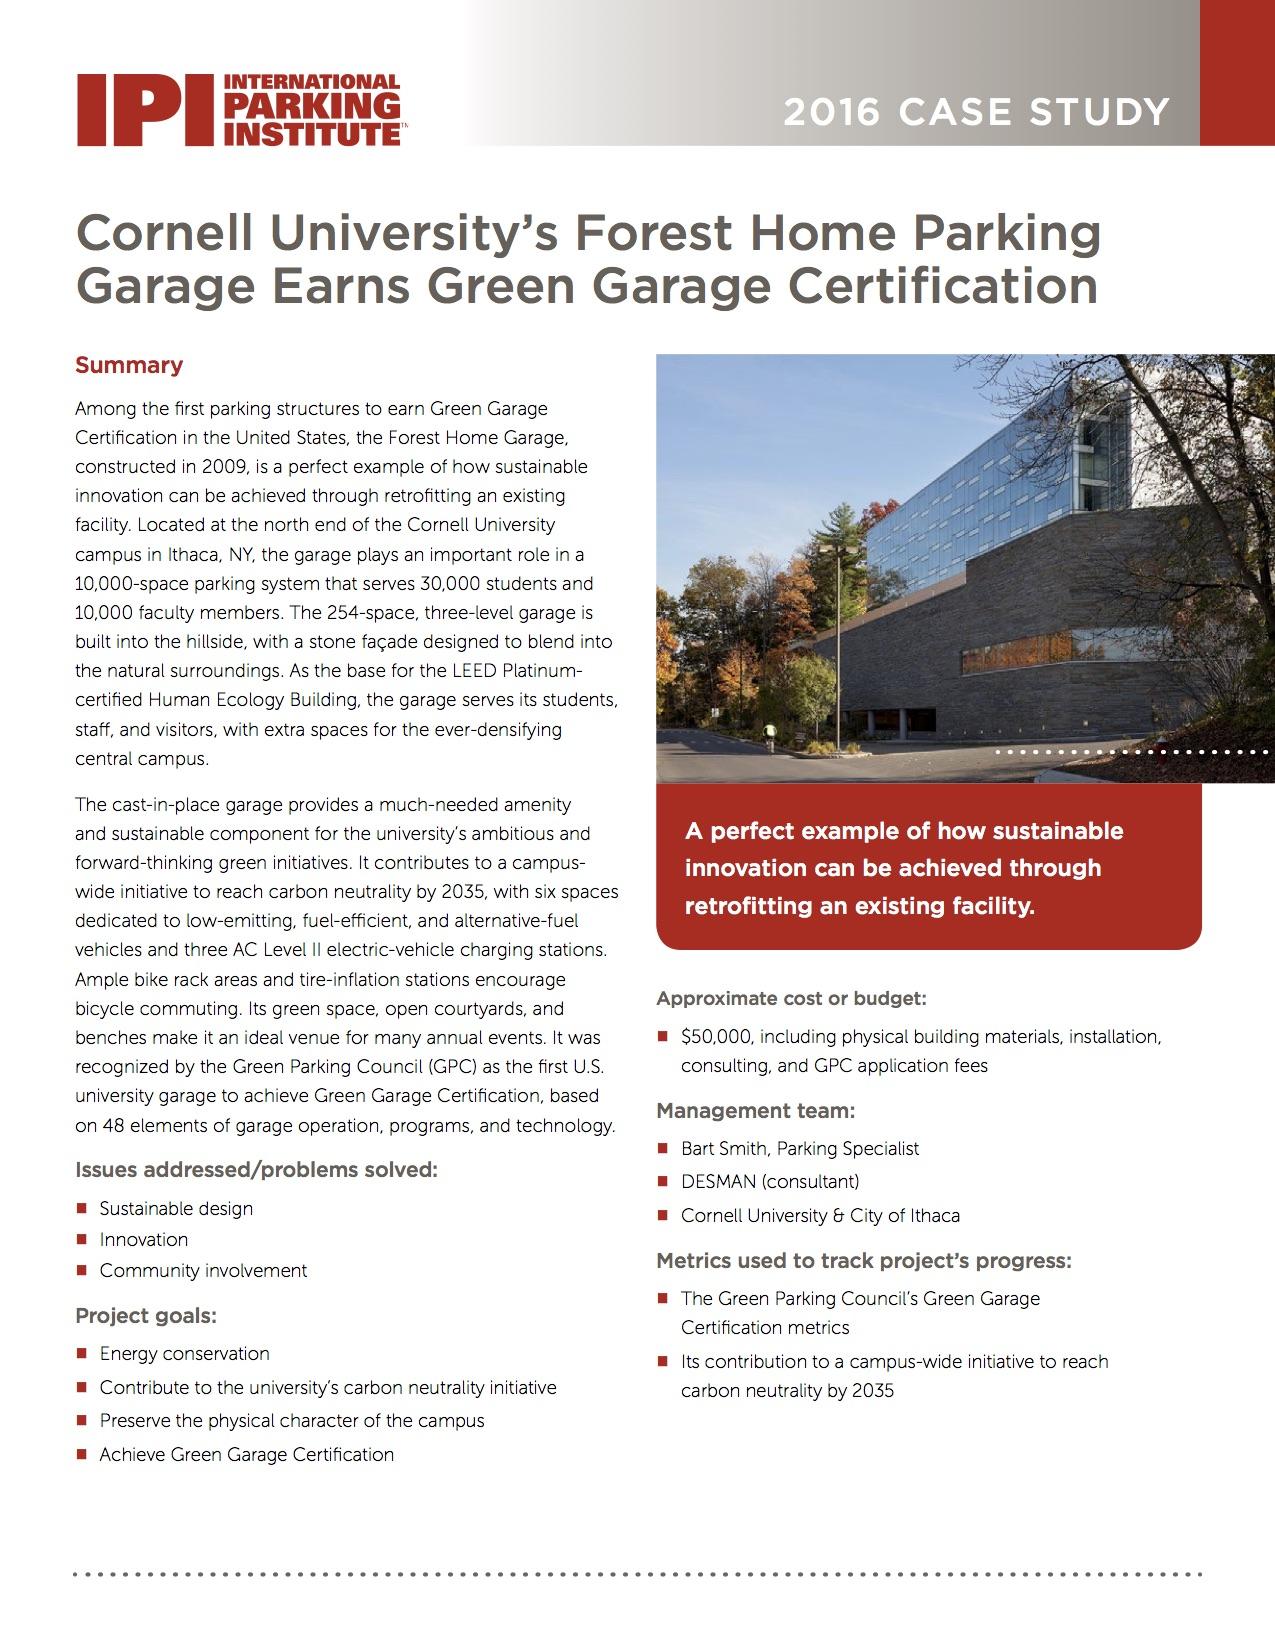 Cornell Universitys Forest Home Parking Garage Earns Green Garage